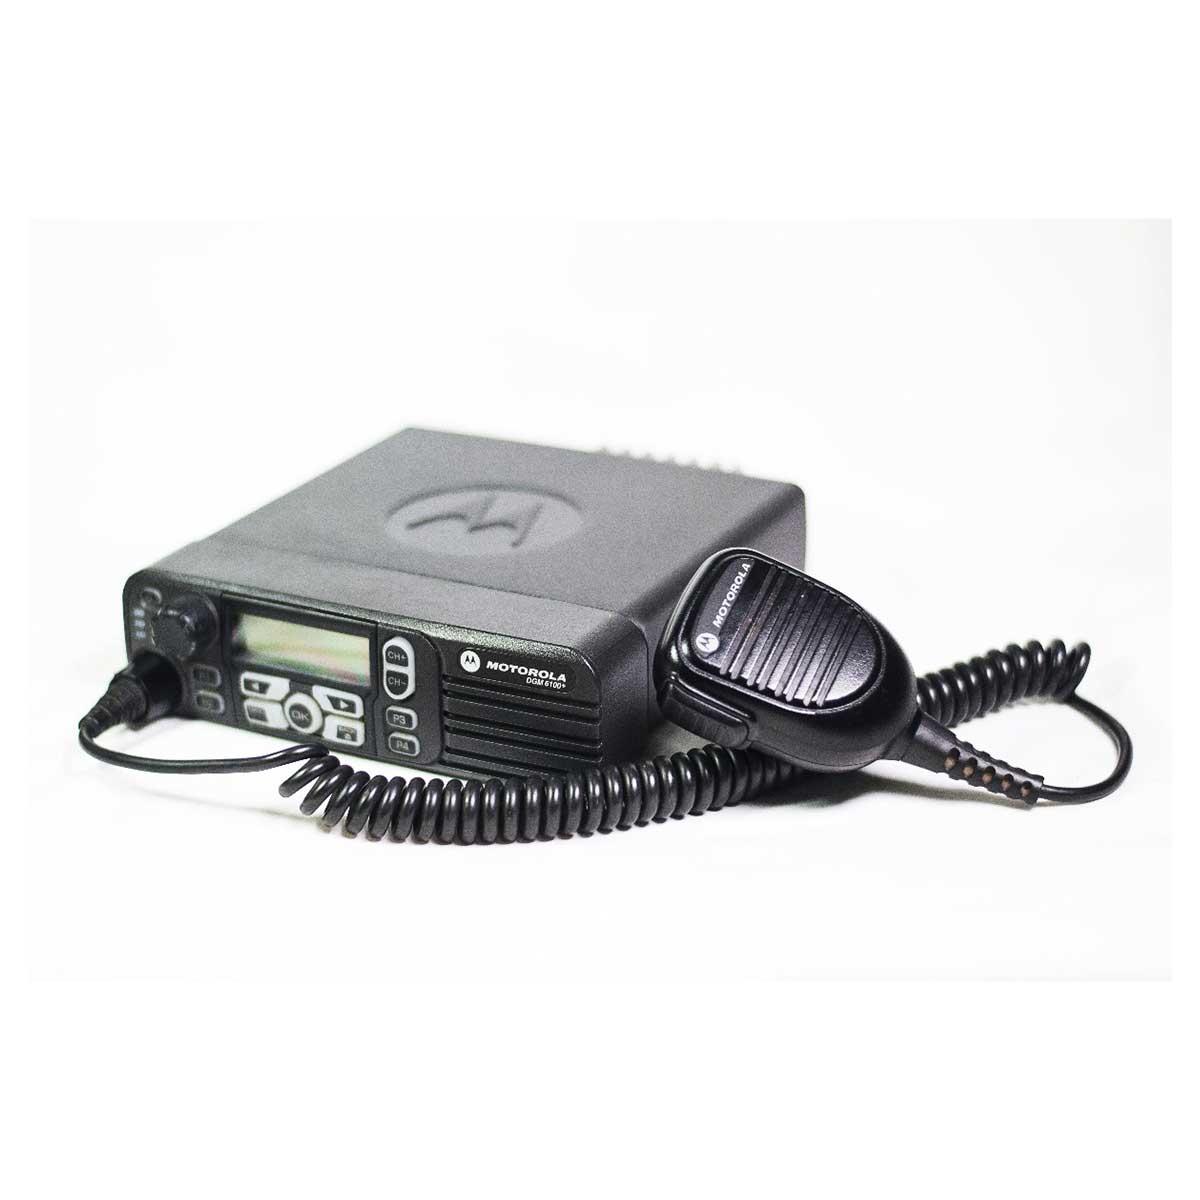 Radio Motorola DGM6100 Digital LAM27QDH9LA1AN LAM27QDH9LA1AN UHF 403-470 MHZ